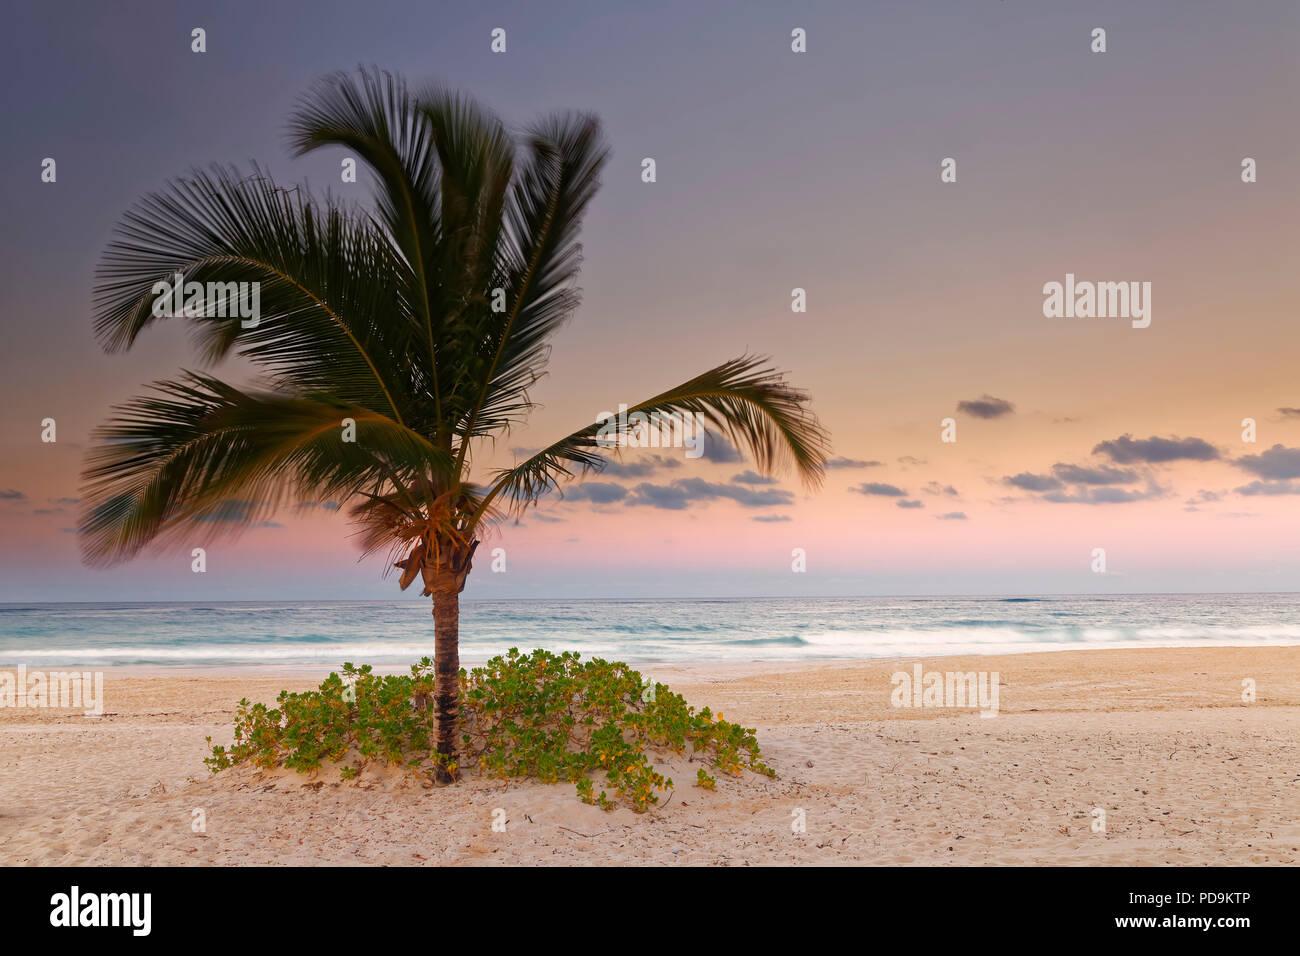 Dusk on the sand beach with palm tree, Playa Bavaro, Punta Cana, Dominican Republic - Stock Image